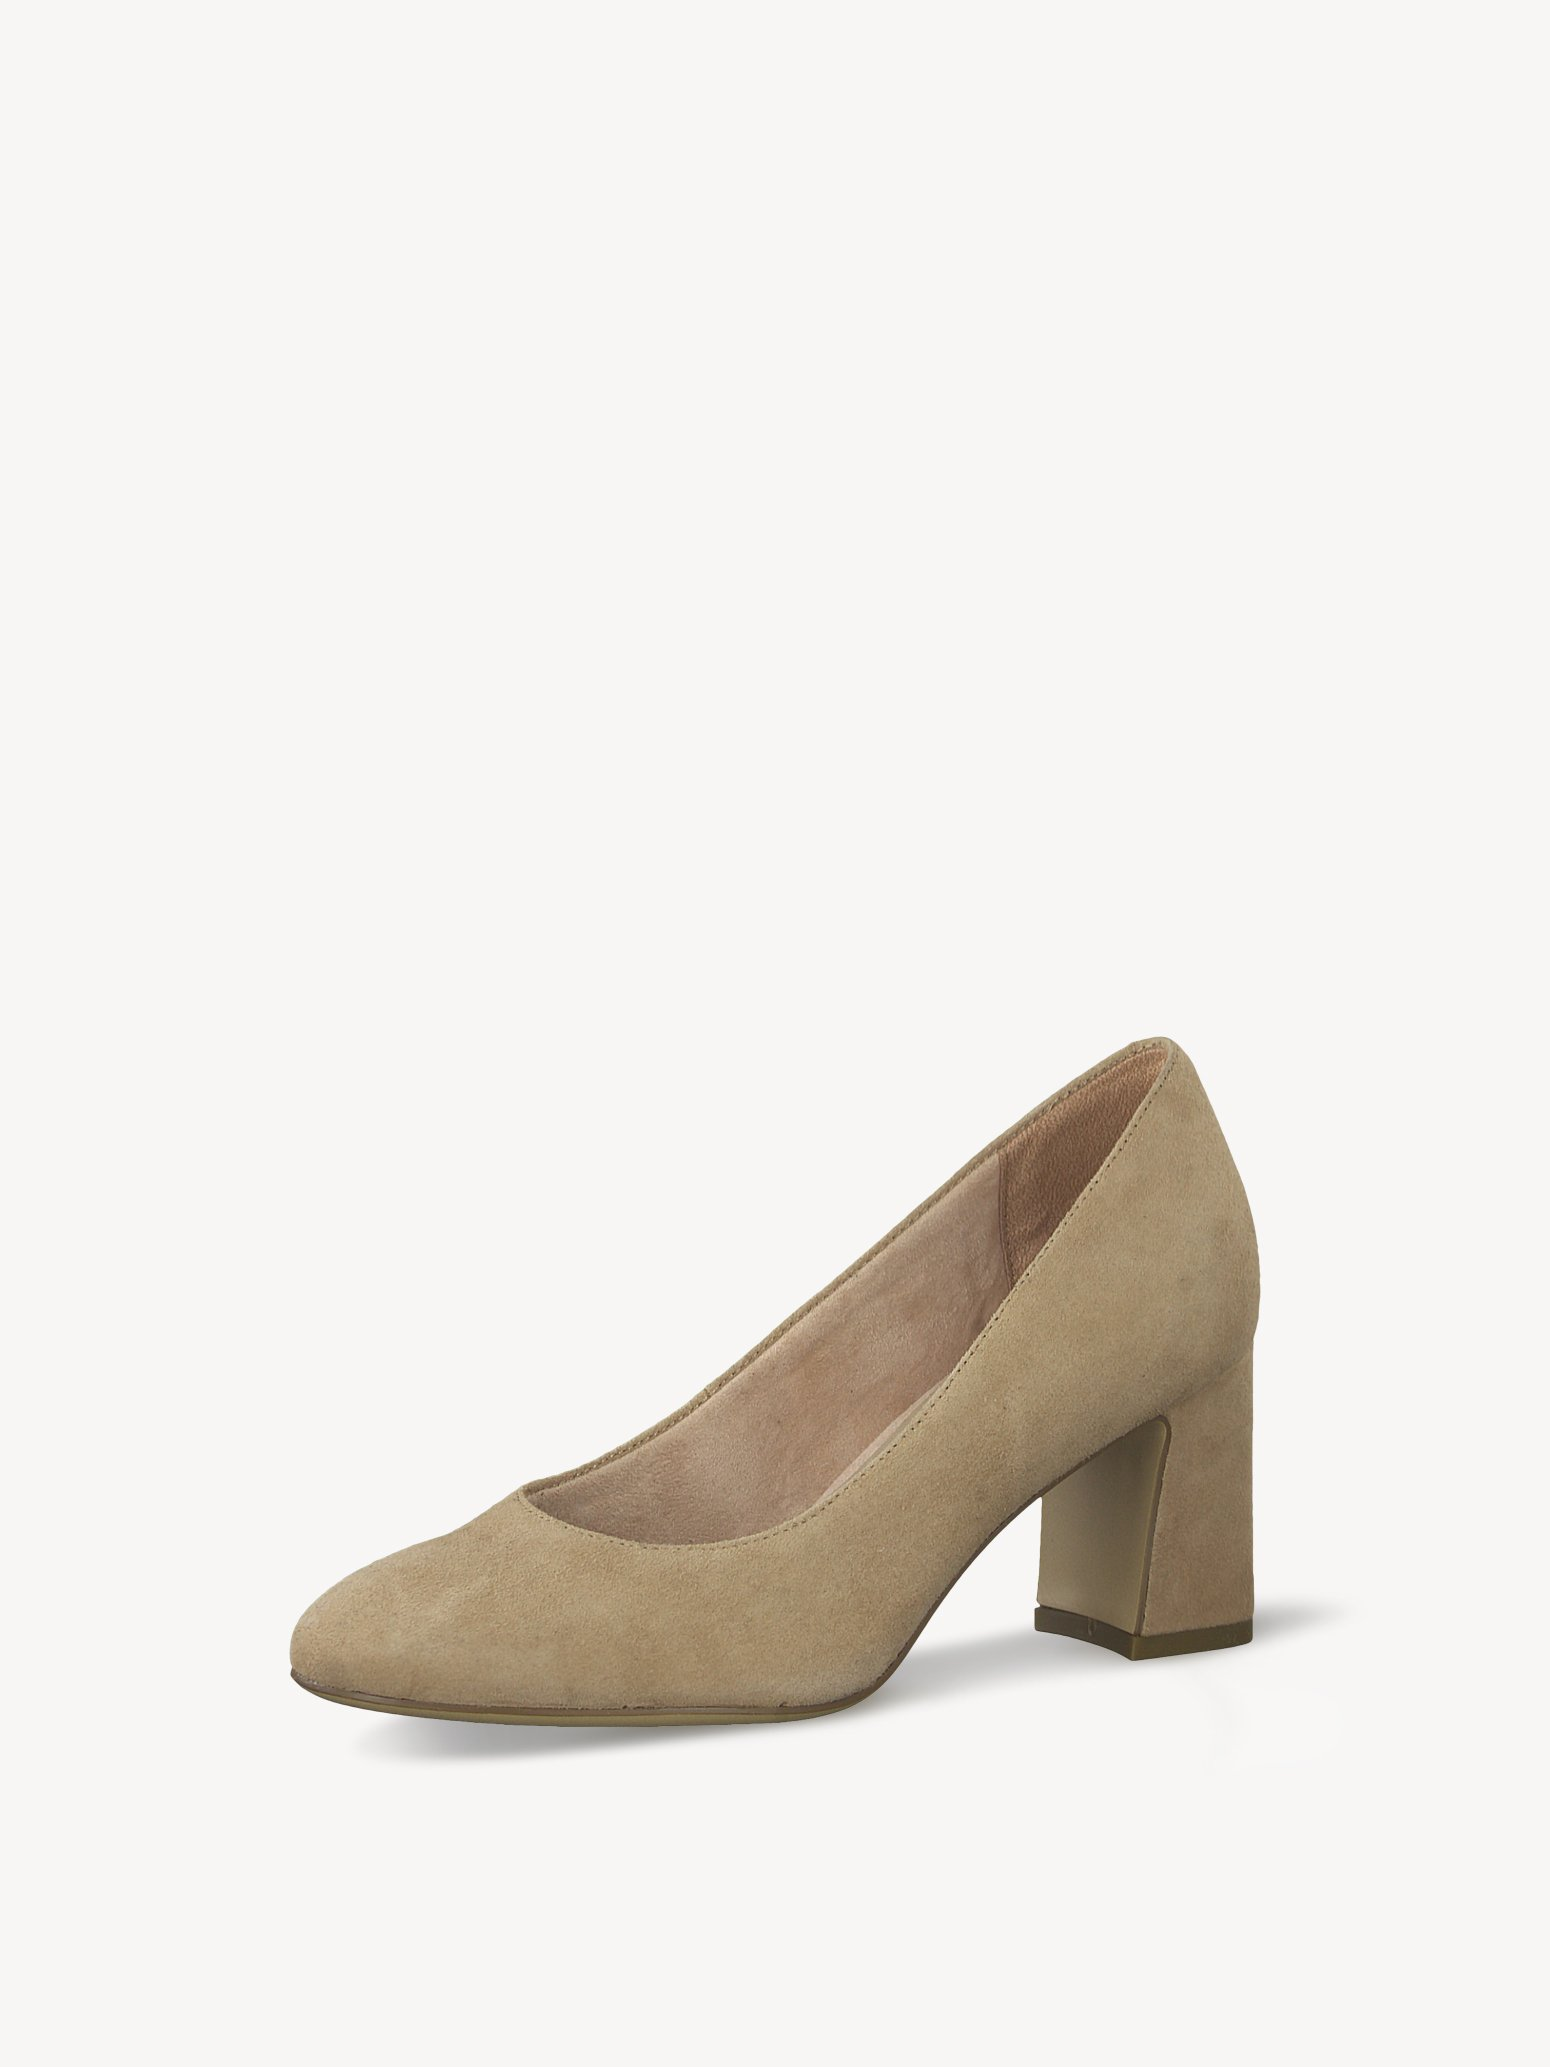 Туфли лодочки Tamaris 1-1-22402-25-252